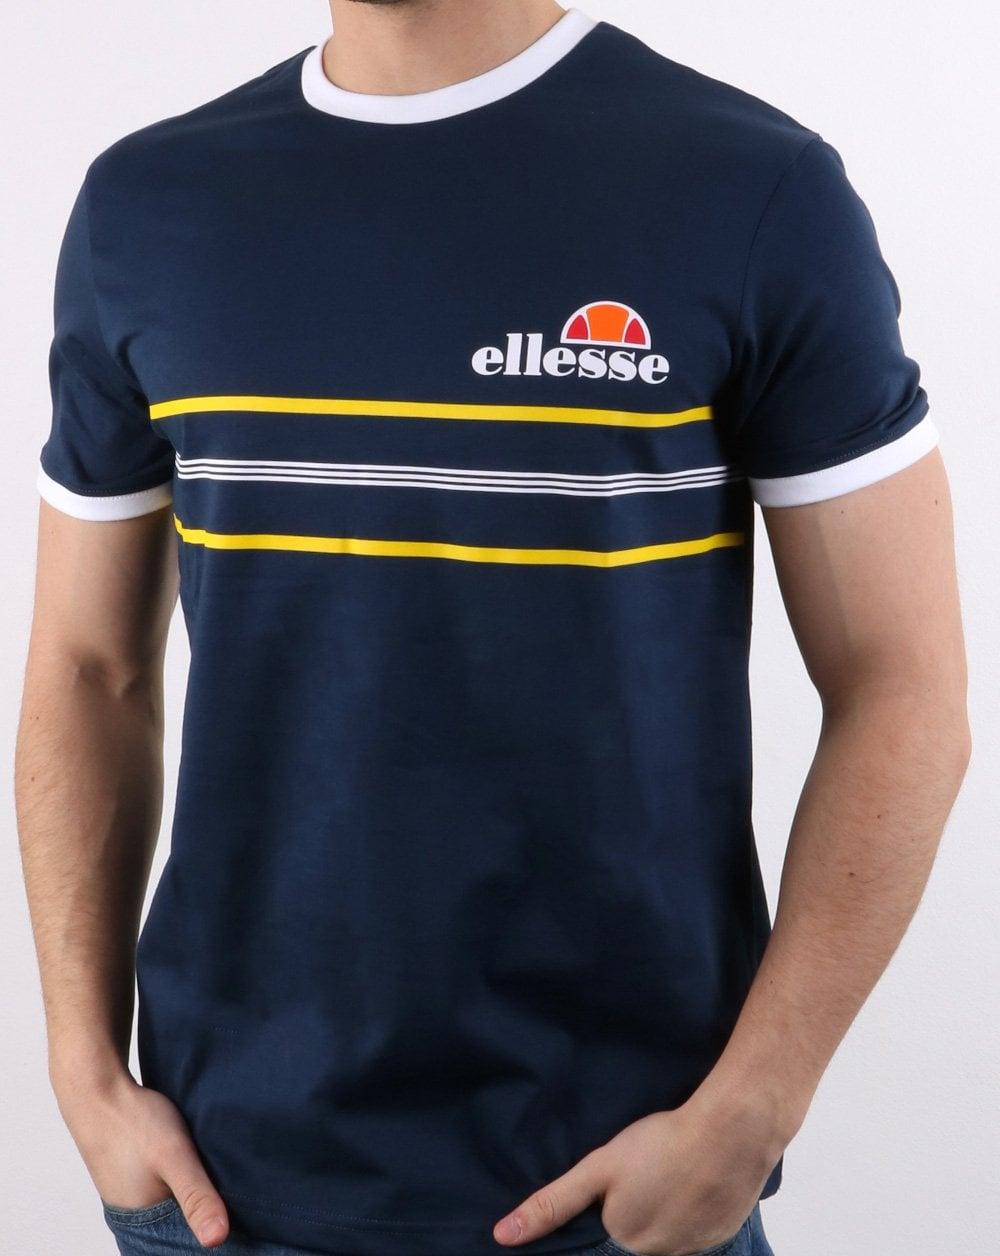 Ellesse Gentario T Shirt Navy